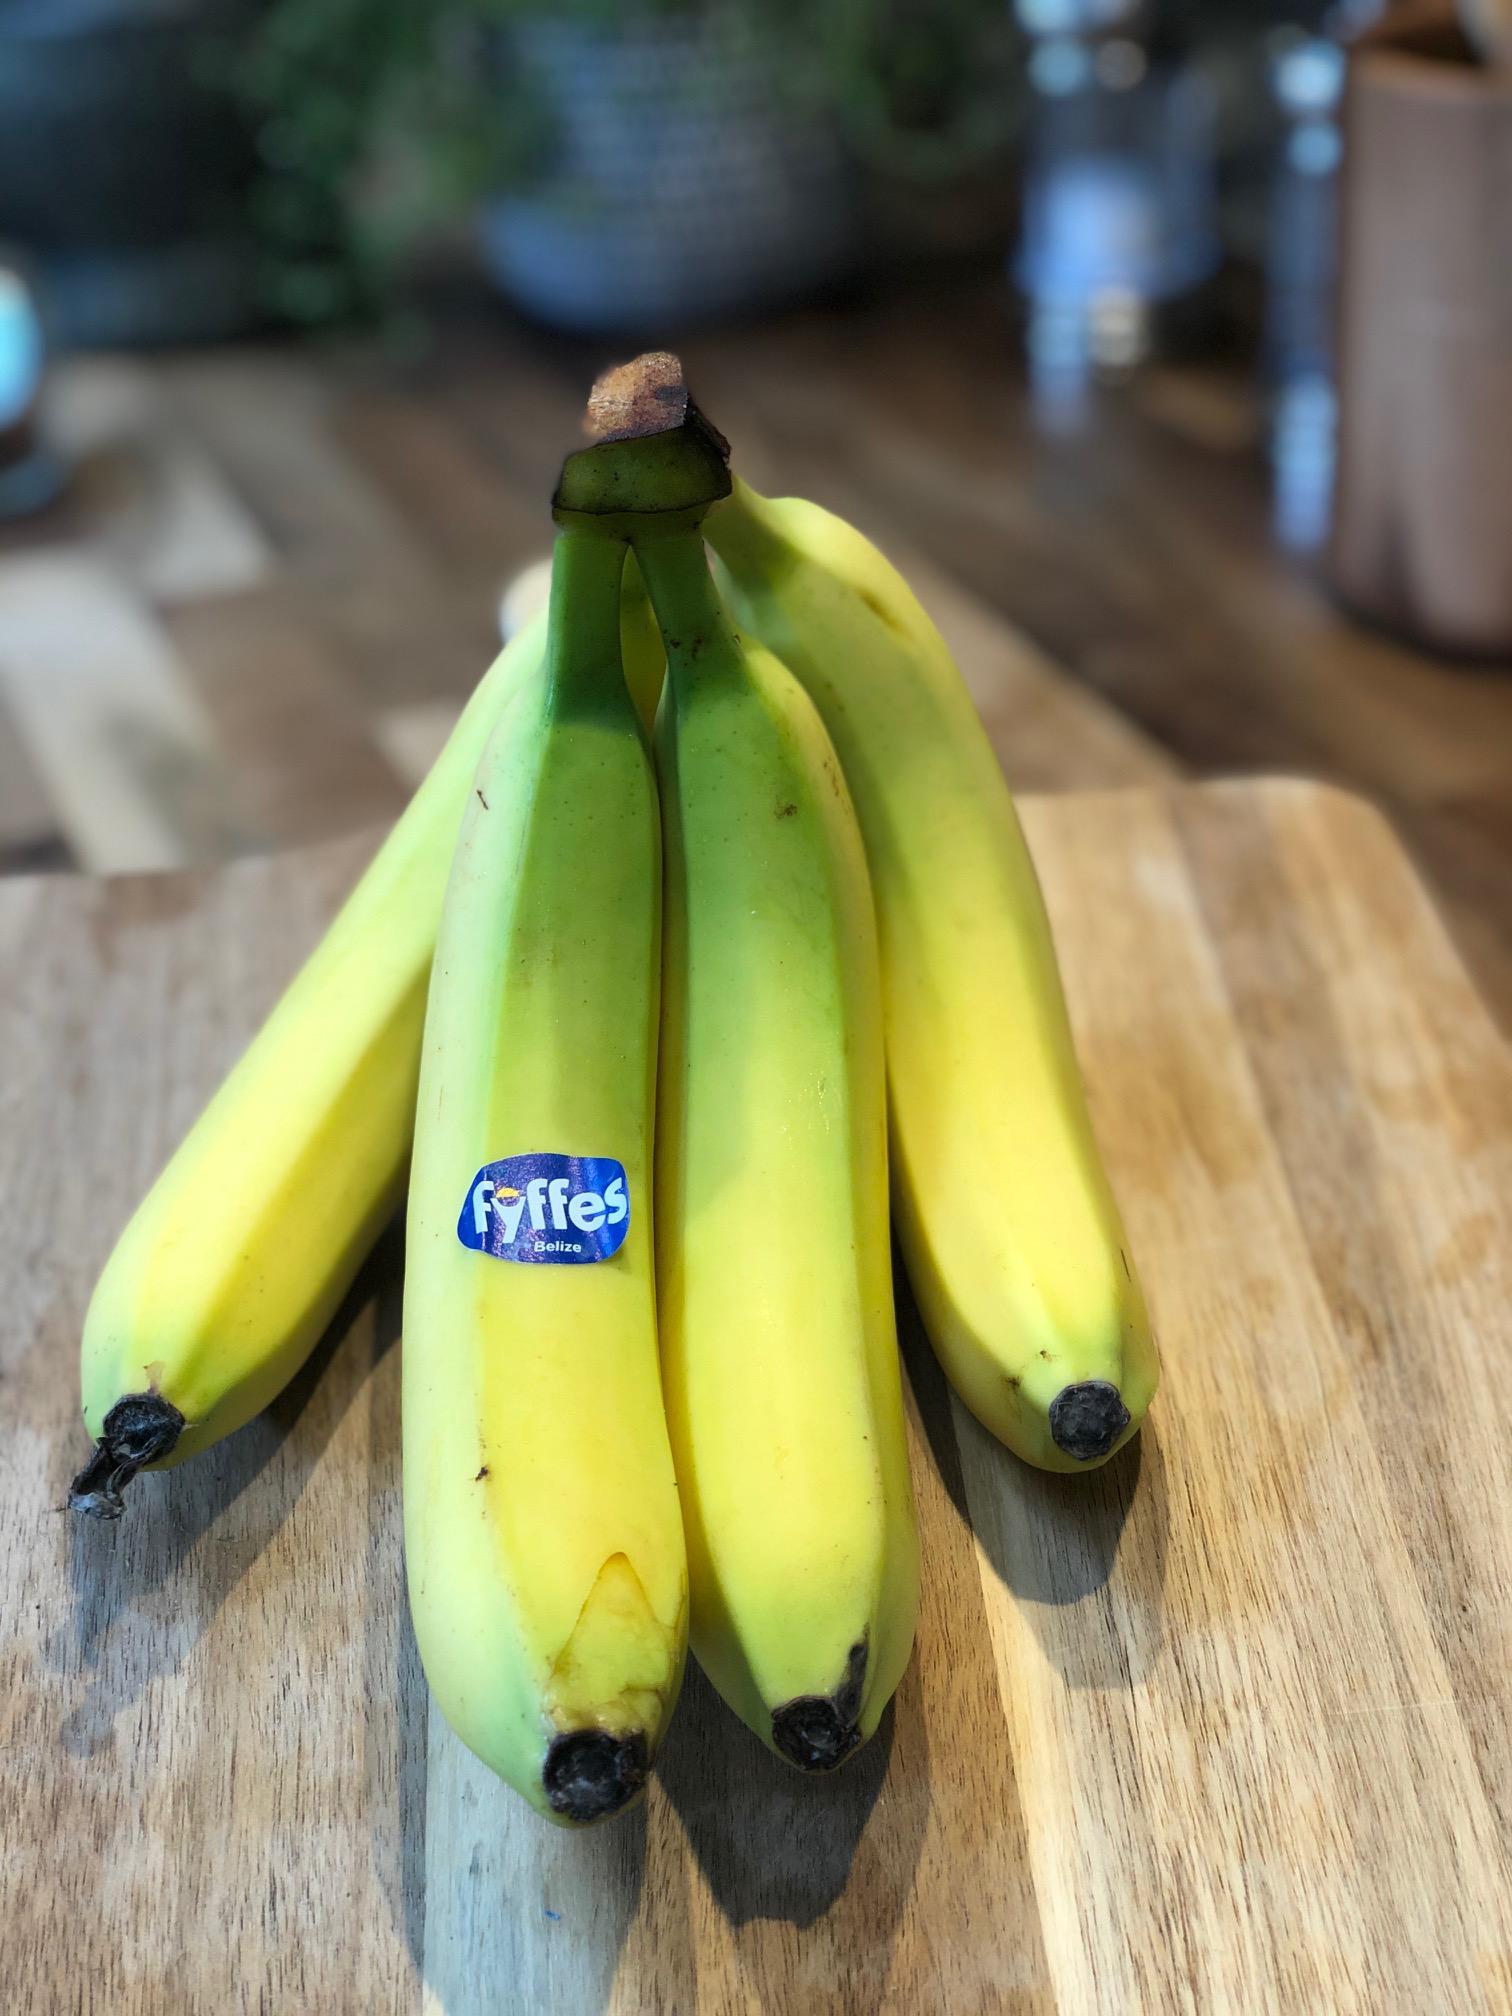 Fruit - Banana